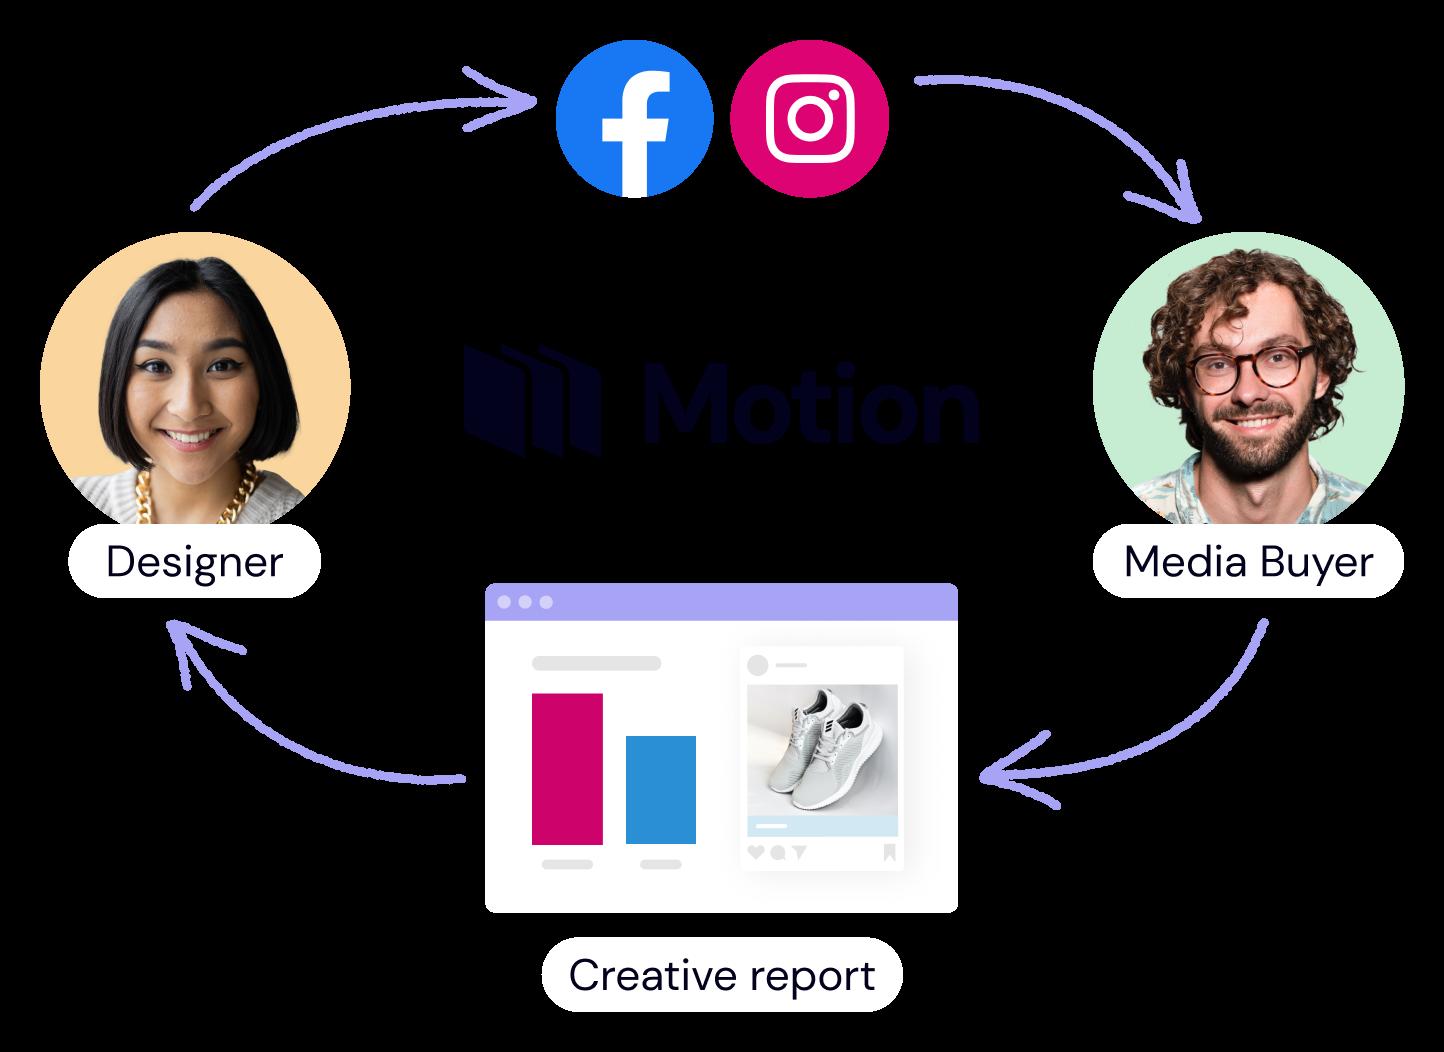 Creative collaboration between media buyer and designer